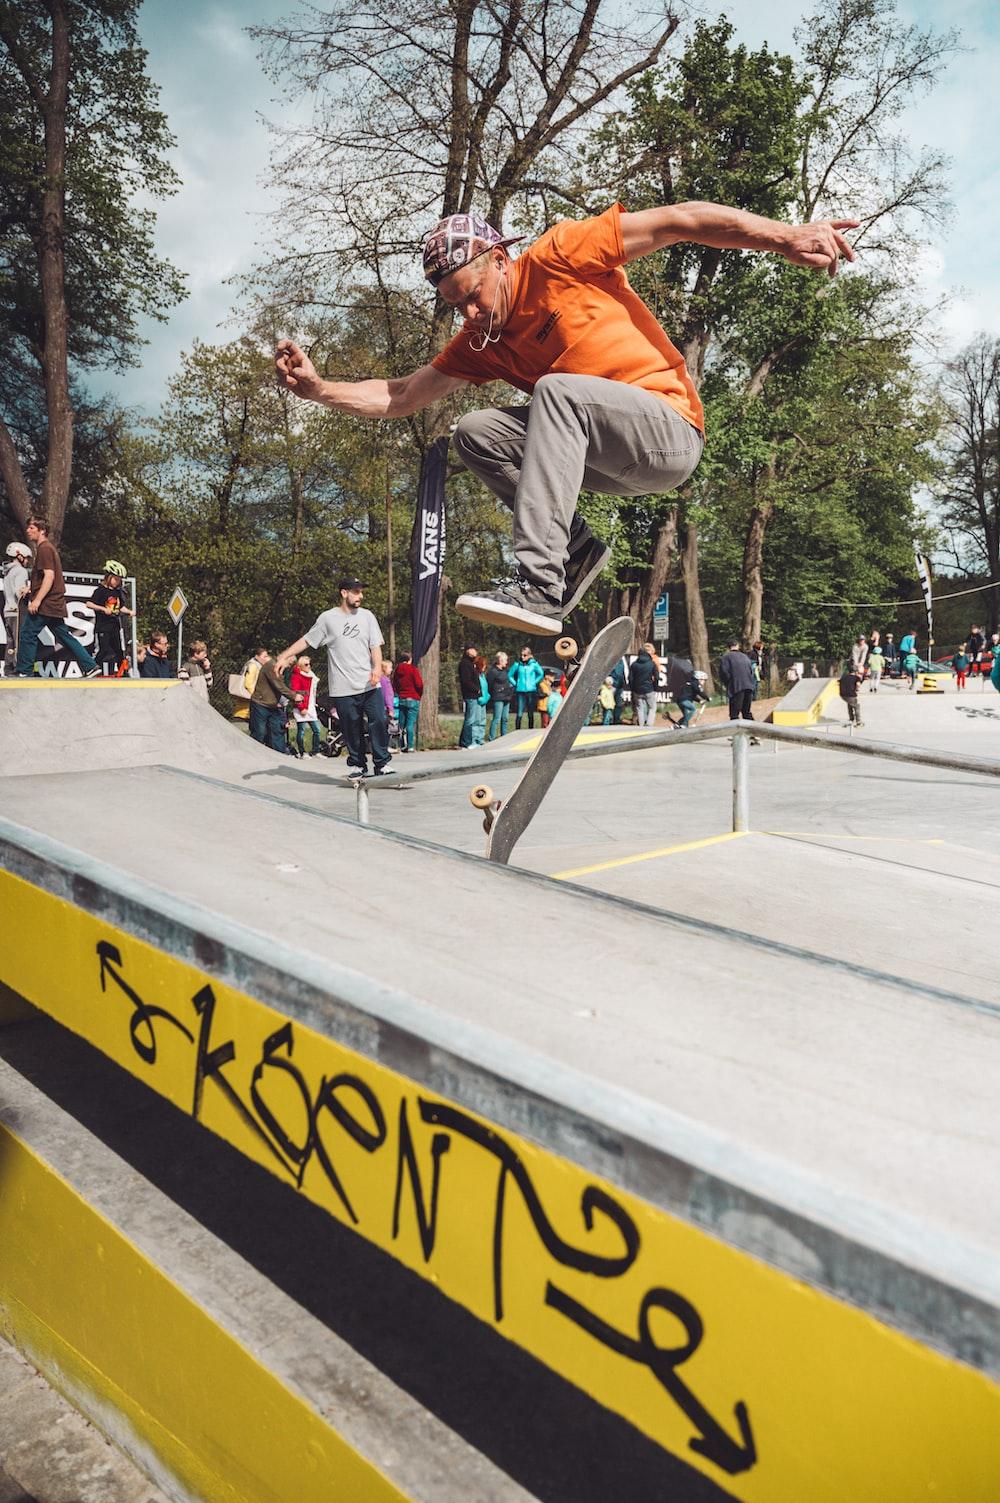 man doing skateboard tricks at the park